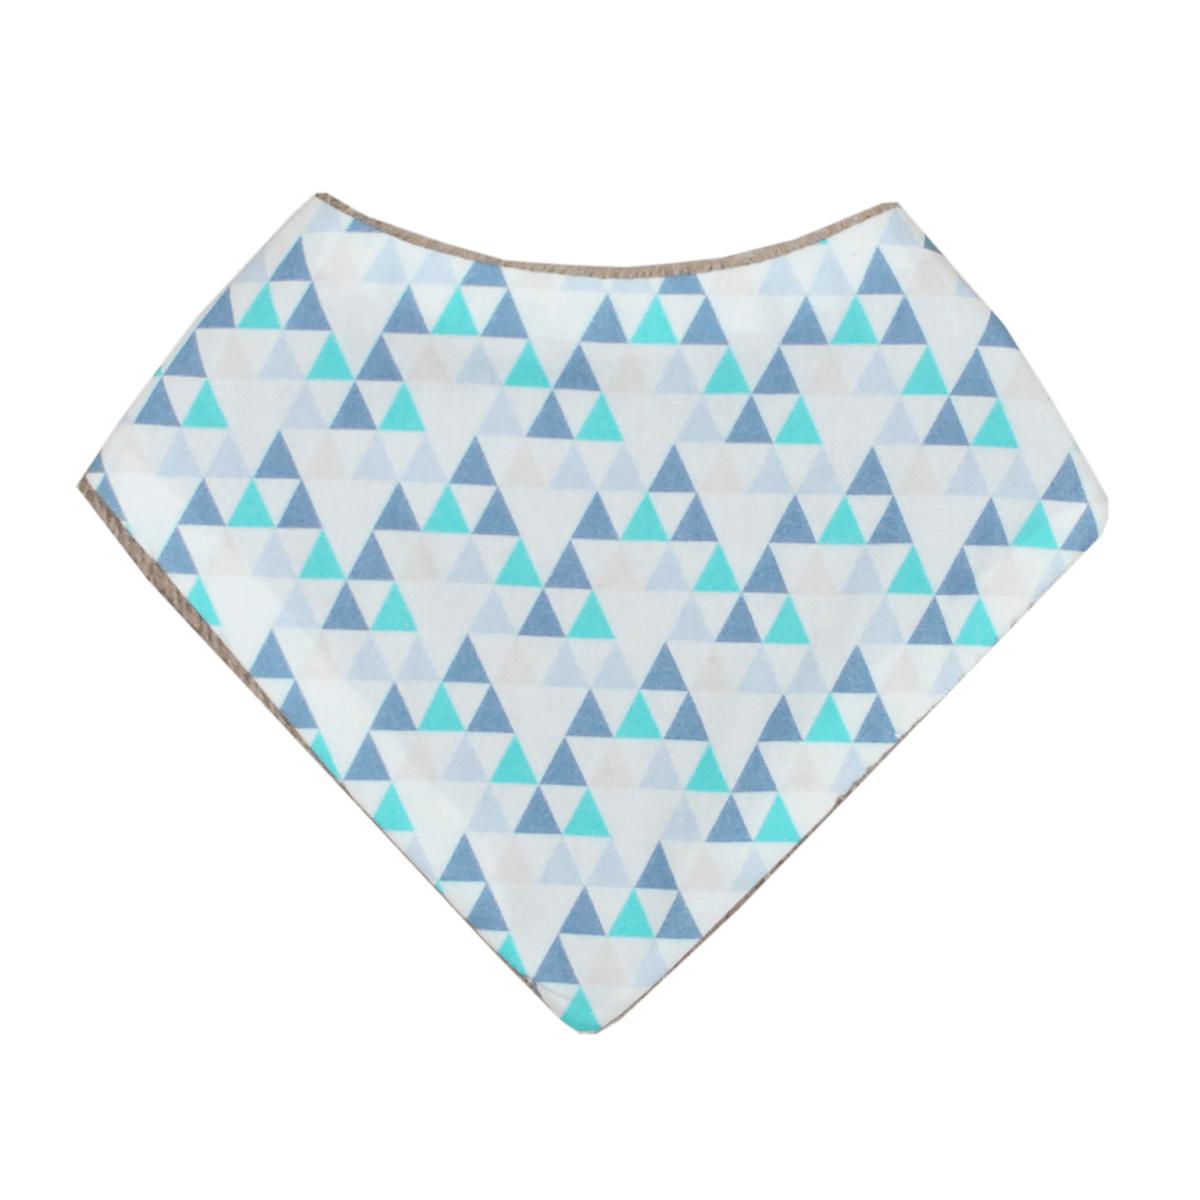 Bavoir Mini Bavoir Triangles Bleus Mini Bavoir Triangles Bleus